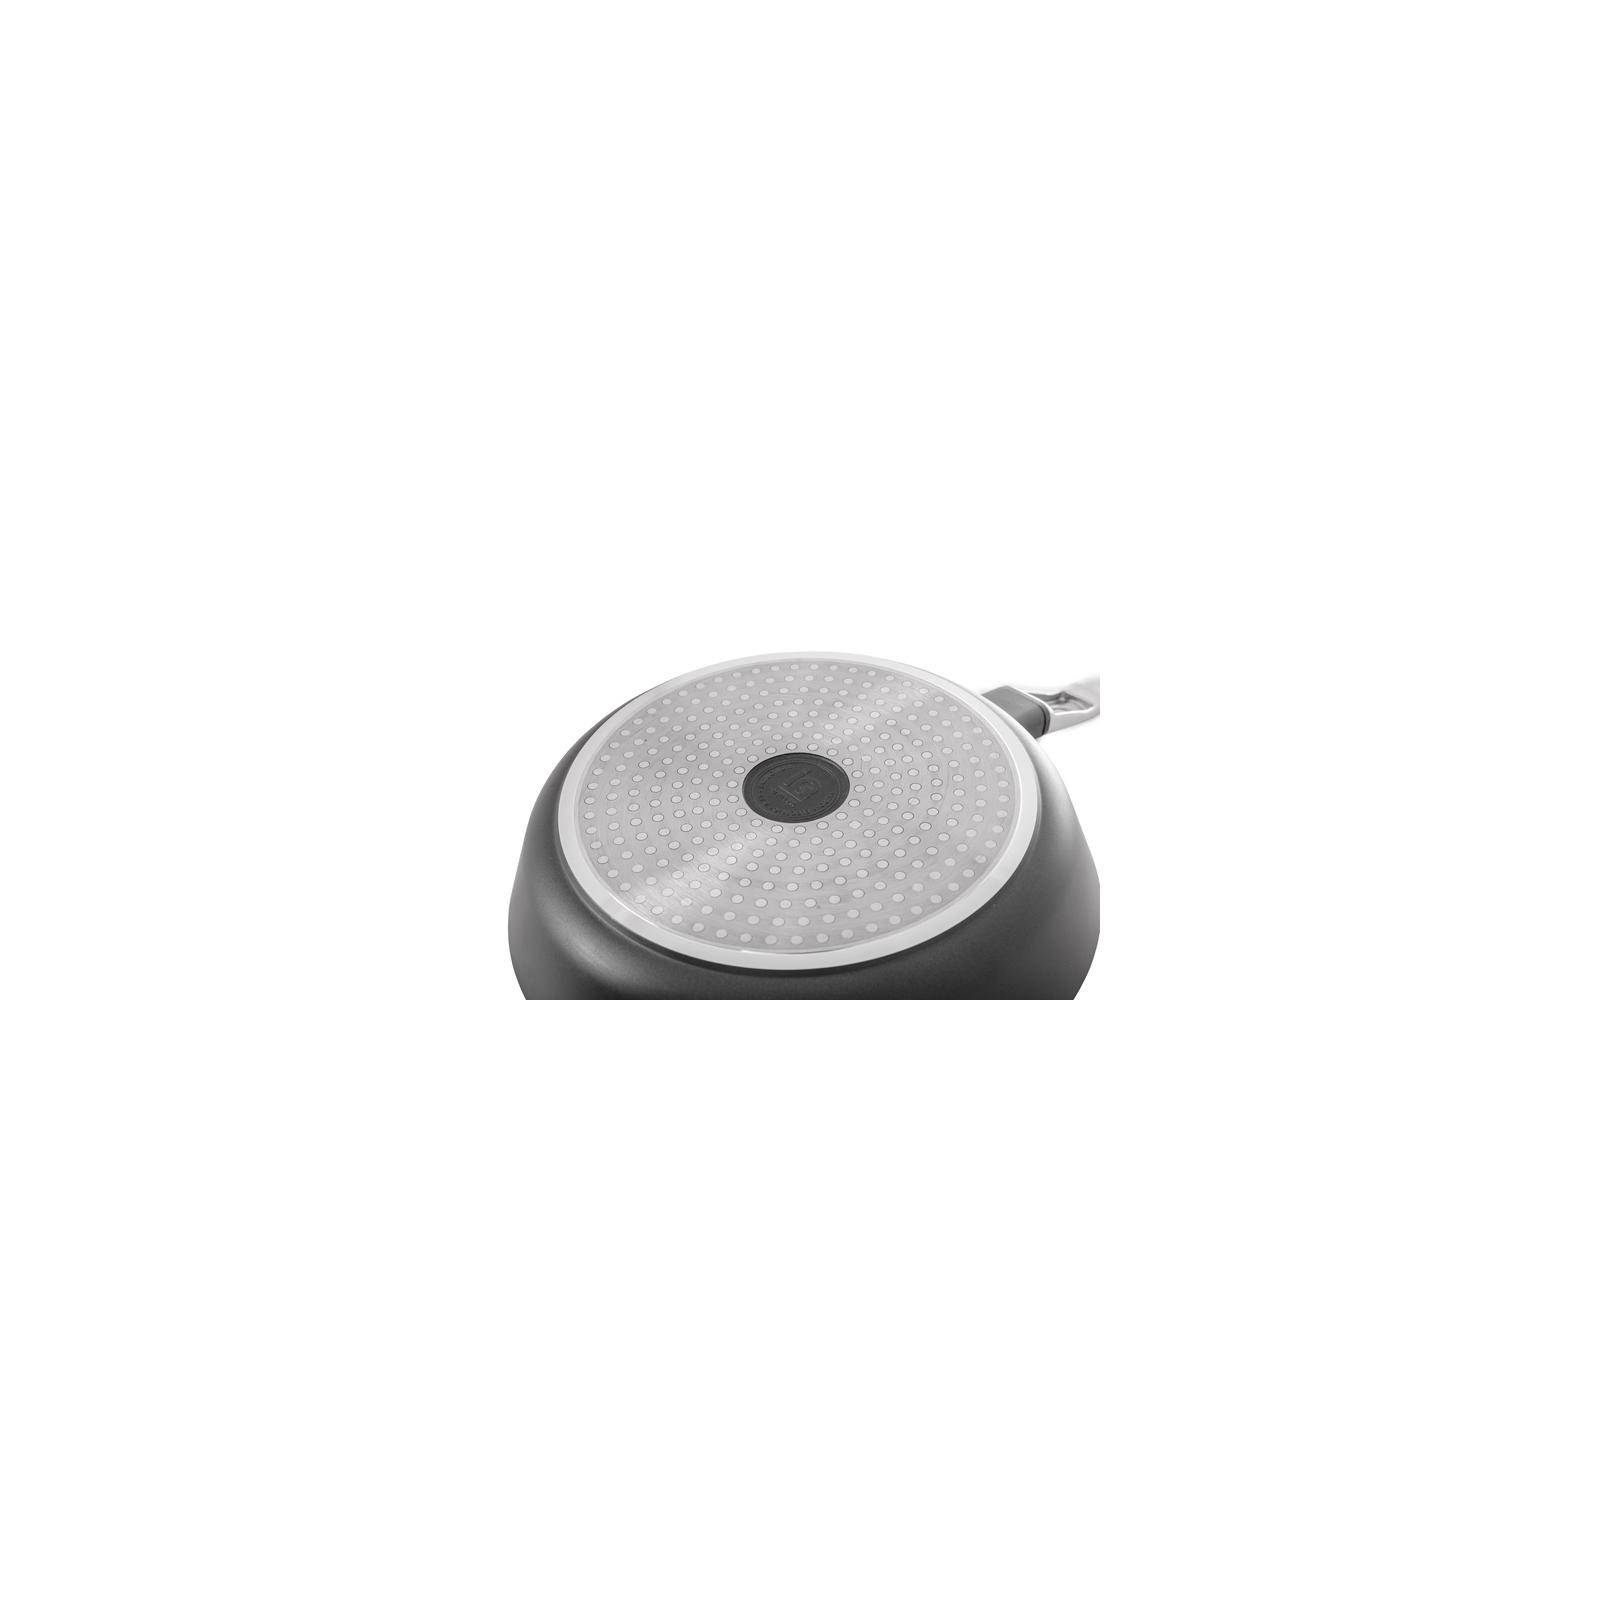 Сковорода Ringel IQ Be Chef 28 см (RG-1126-28) изображение 7